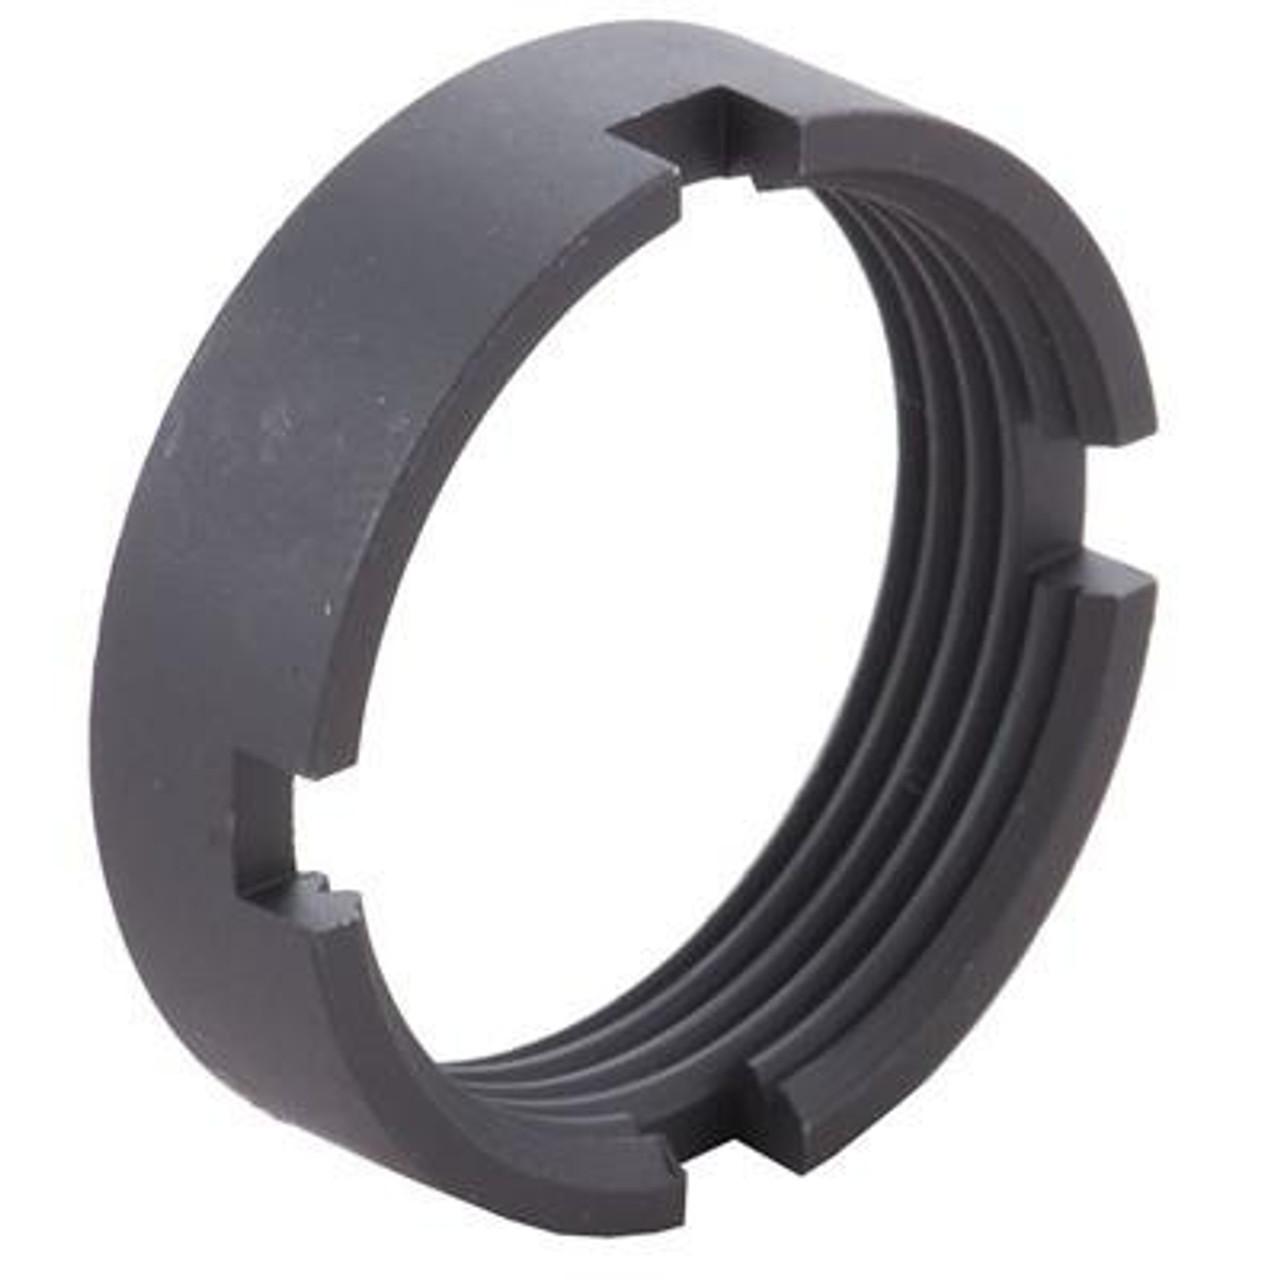 AR-15 Castle Stock Lock Ring Nut